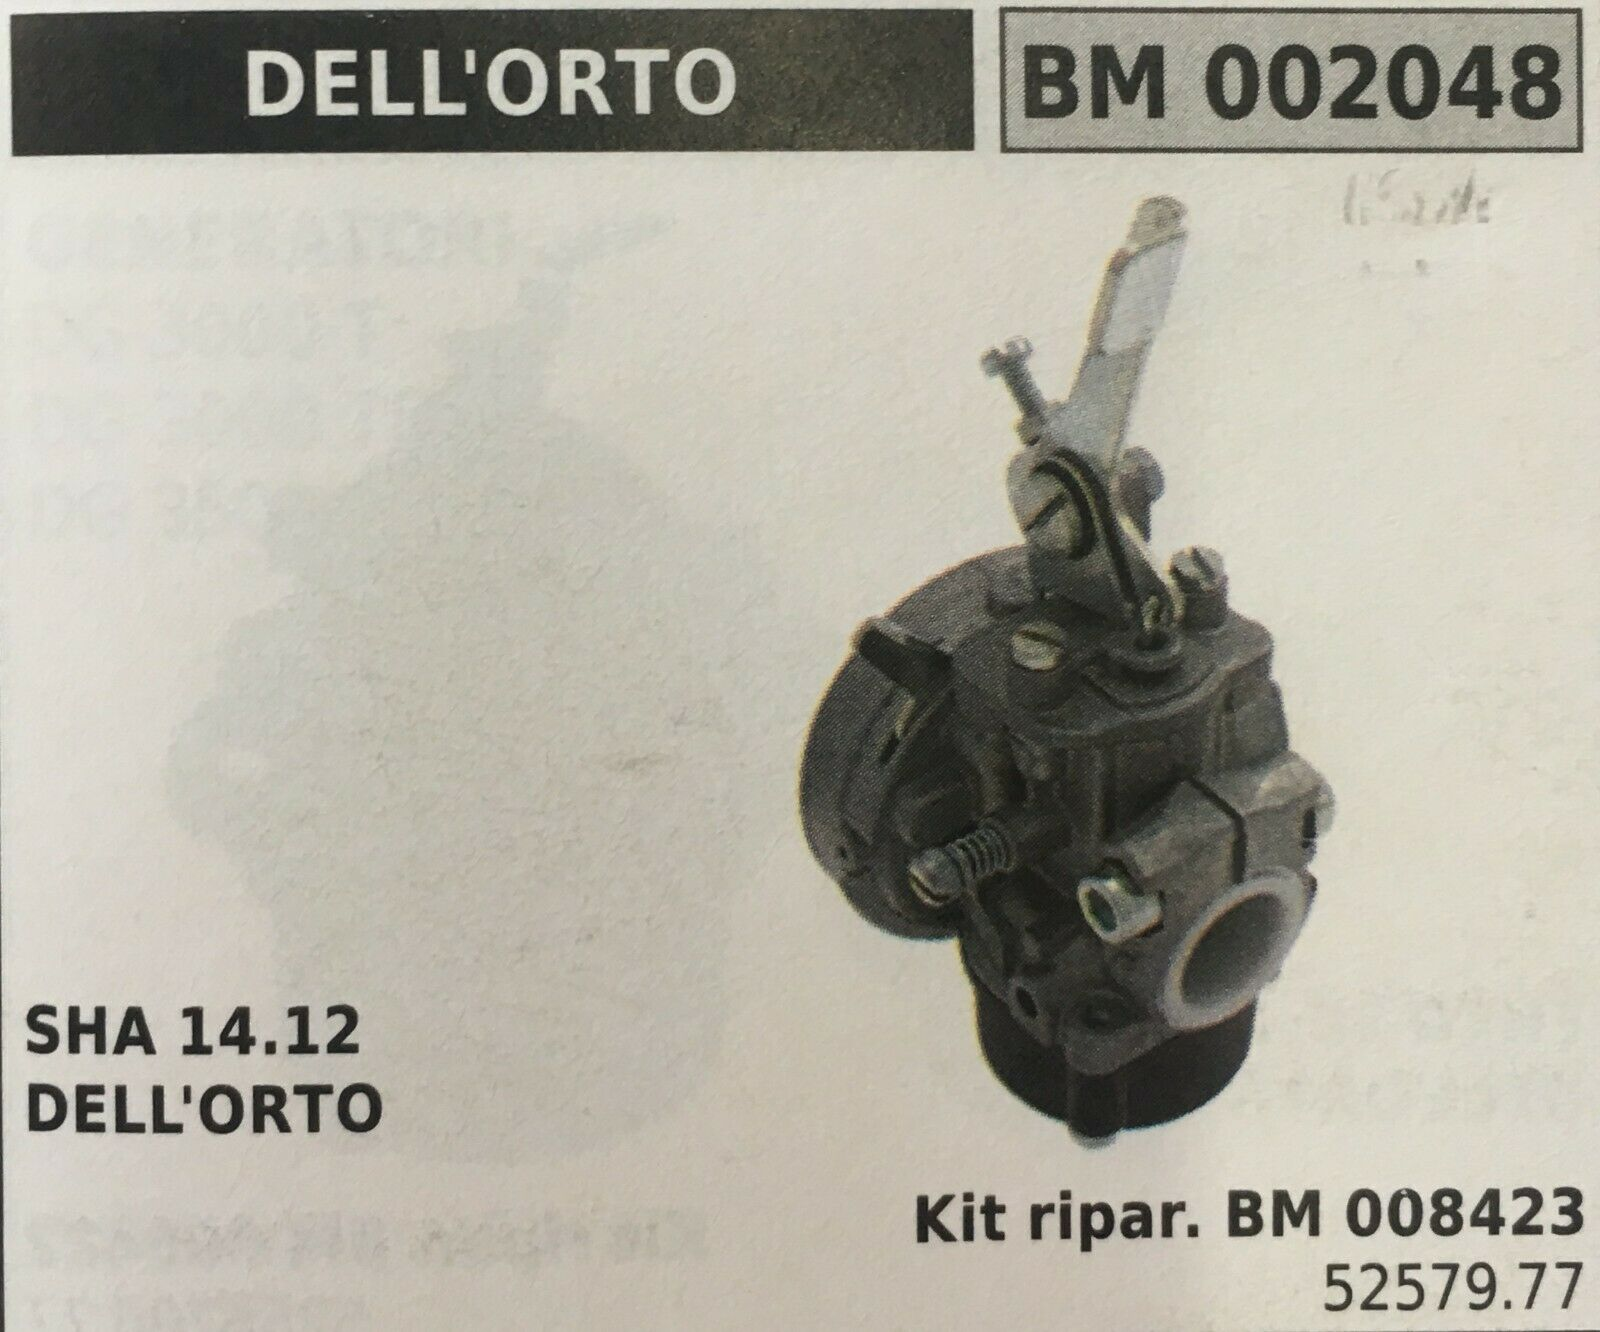 Cocheburador a Tanque Brumar Dell'Orto BM002048